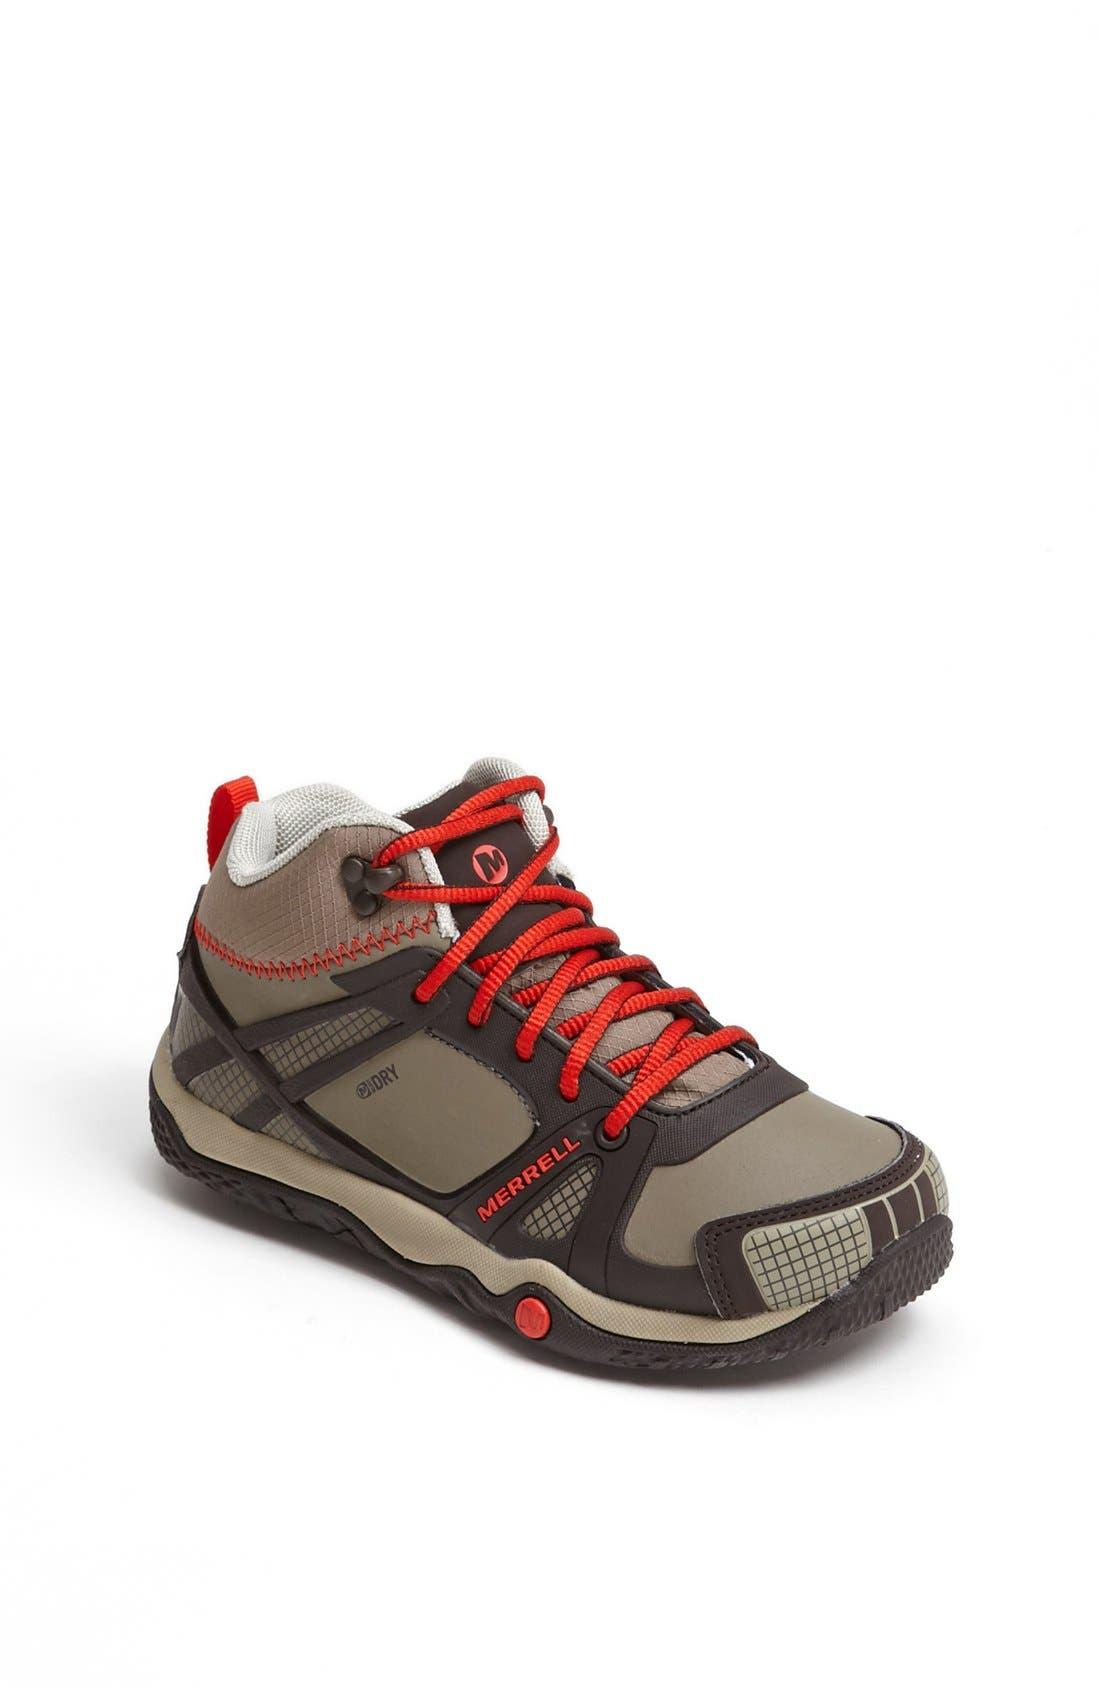 MERRELL,                             'Proterra' Mid High Waterproof Sneaker,                             Main thumbnail 1, color,                             201